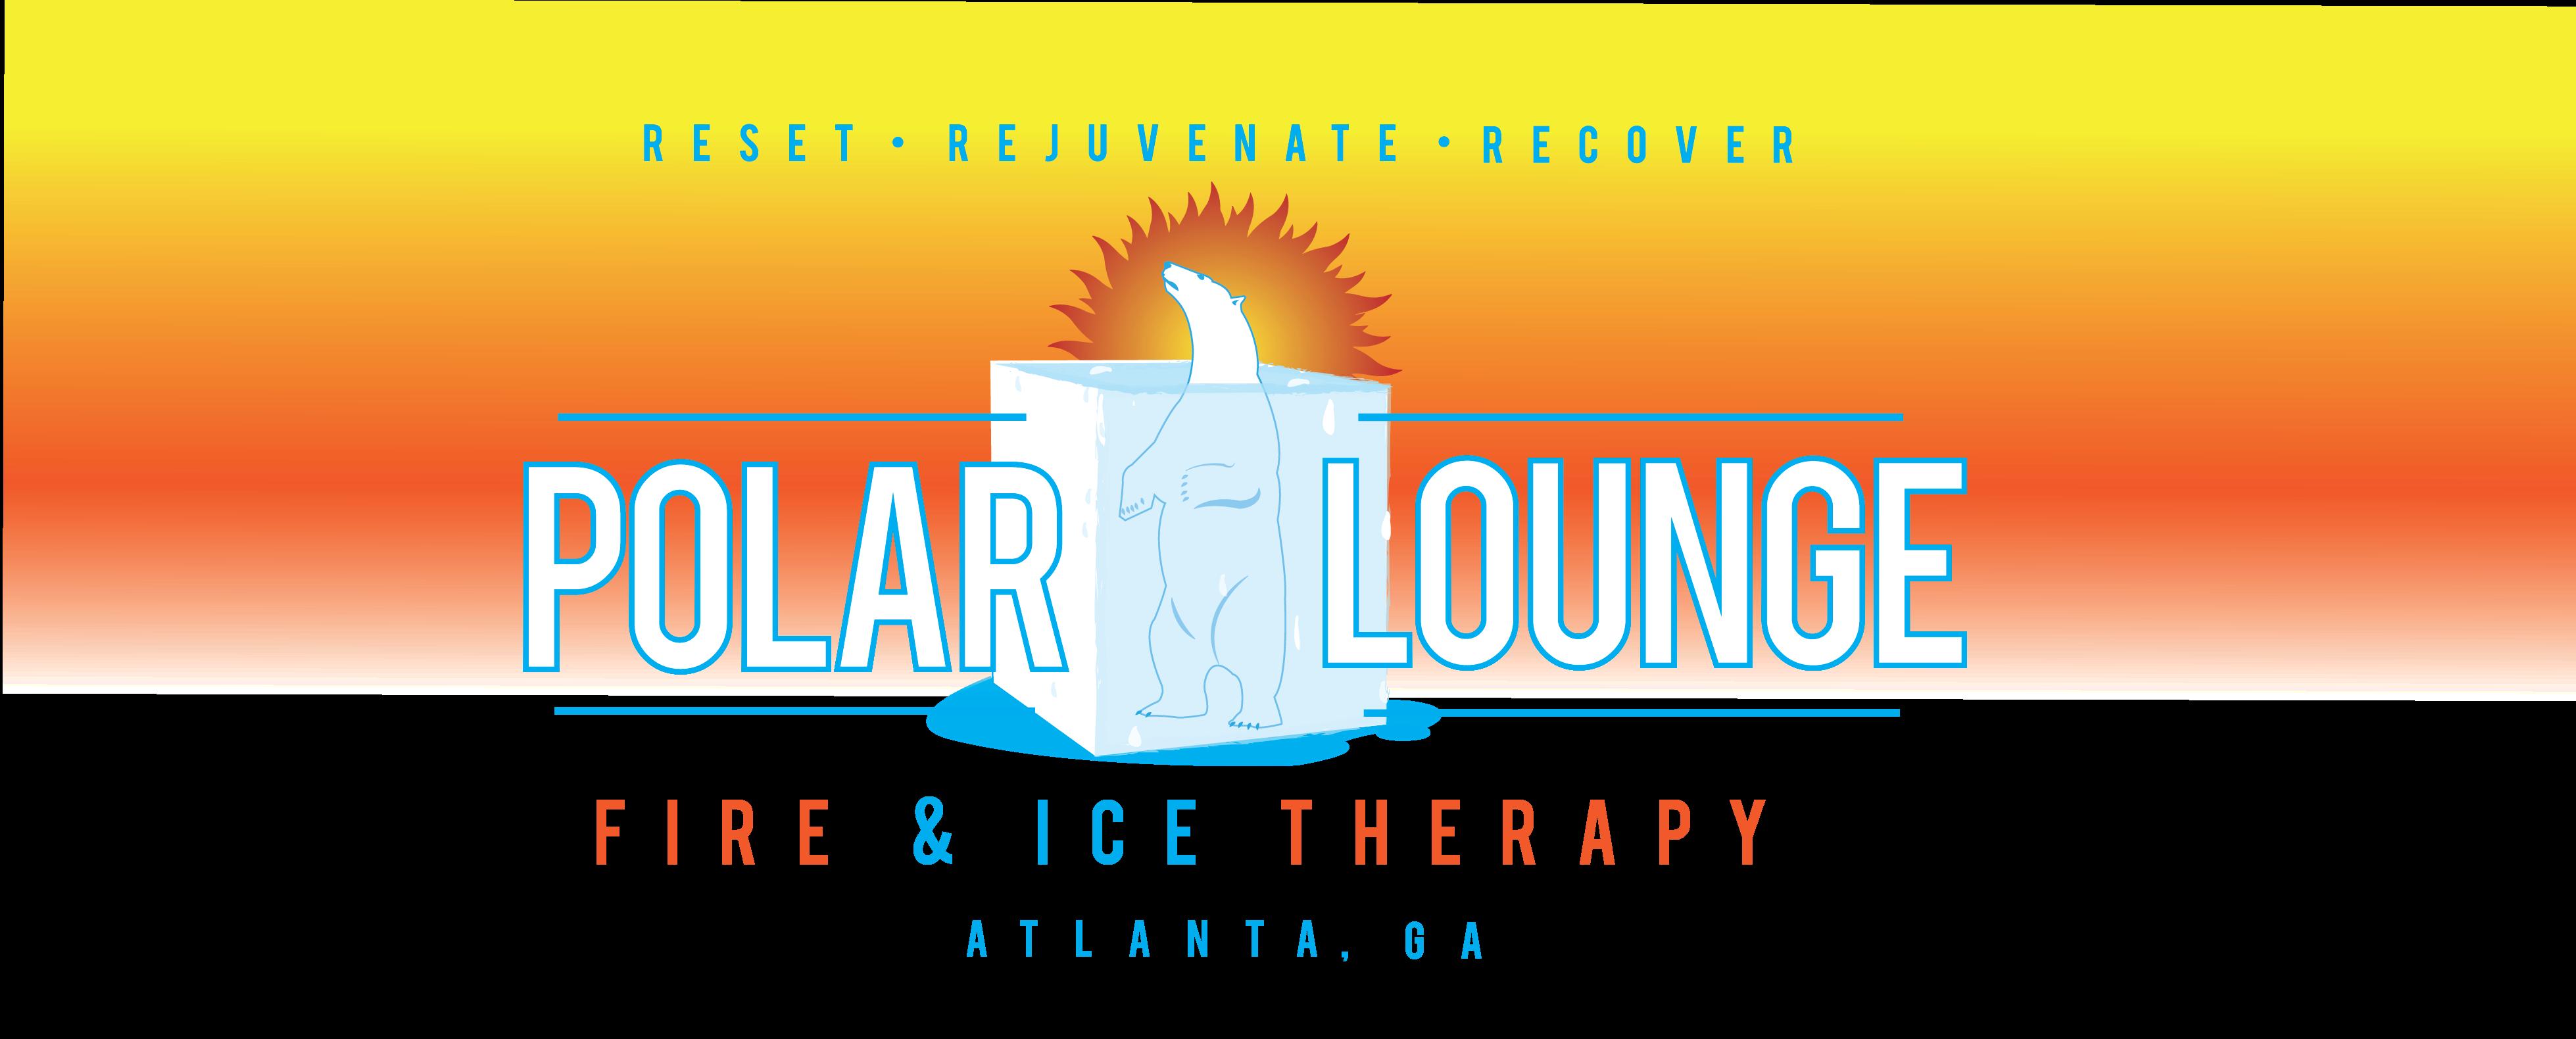 Polar-Lounge_FIREICE_Banner-01